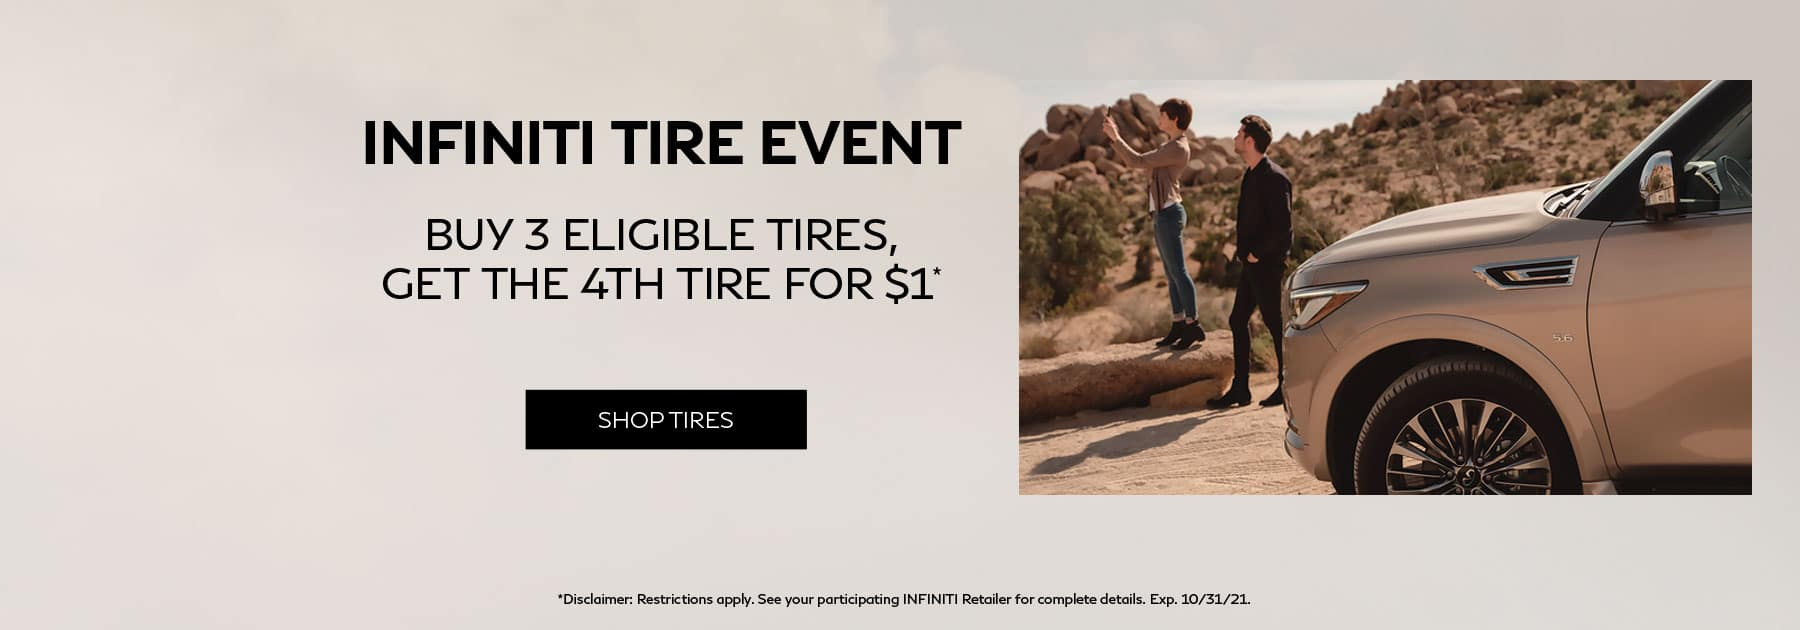 INFINITI Tire Event